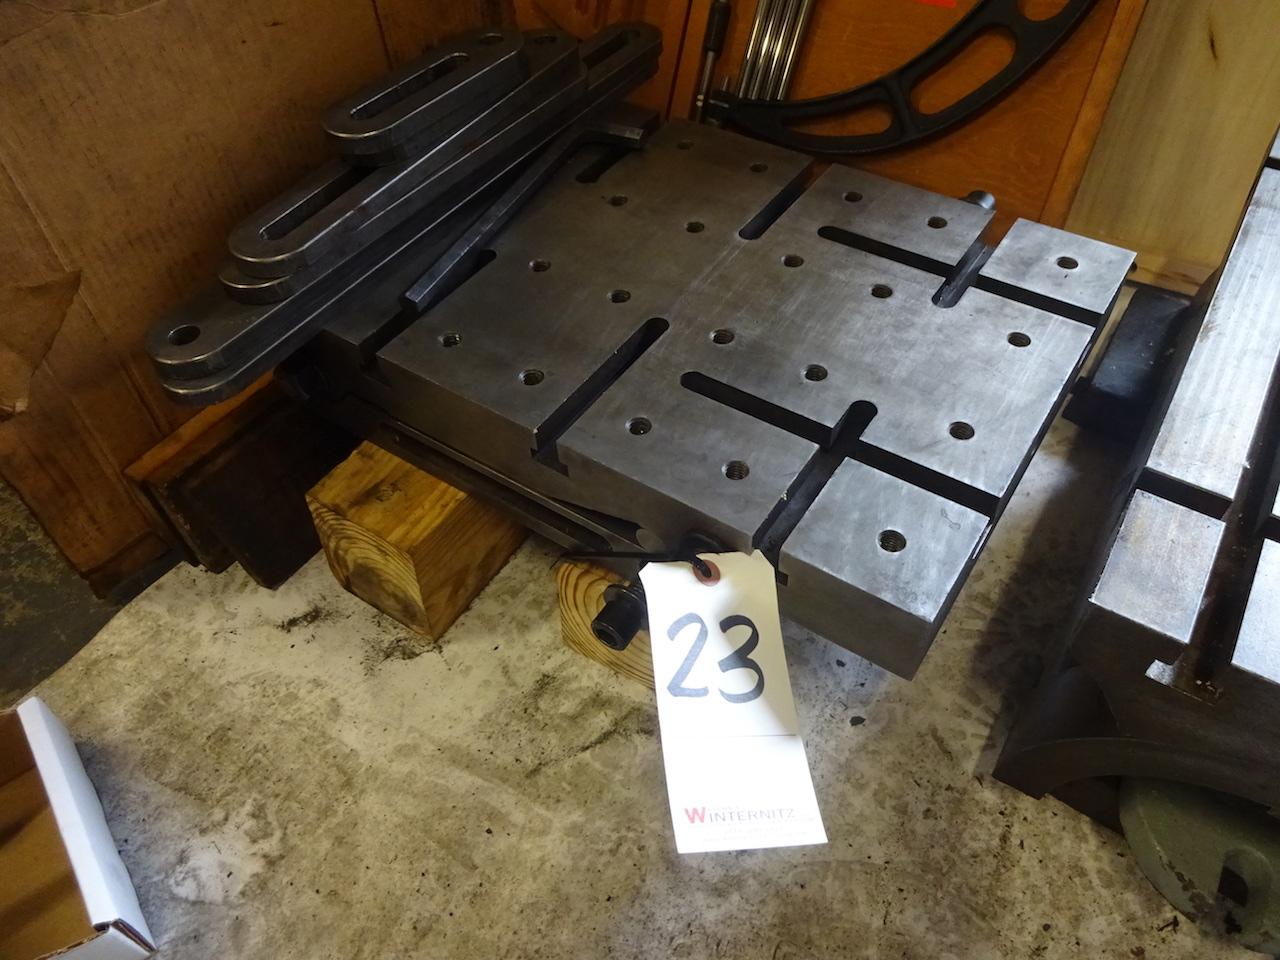 Lot 23 - Adjustable T-Slot Plate